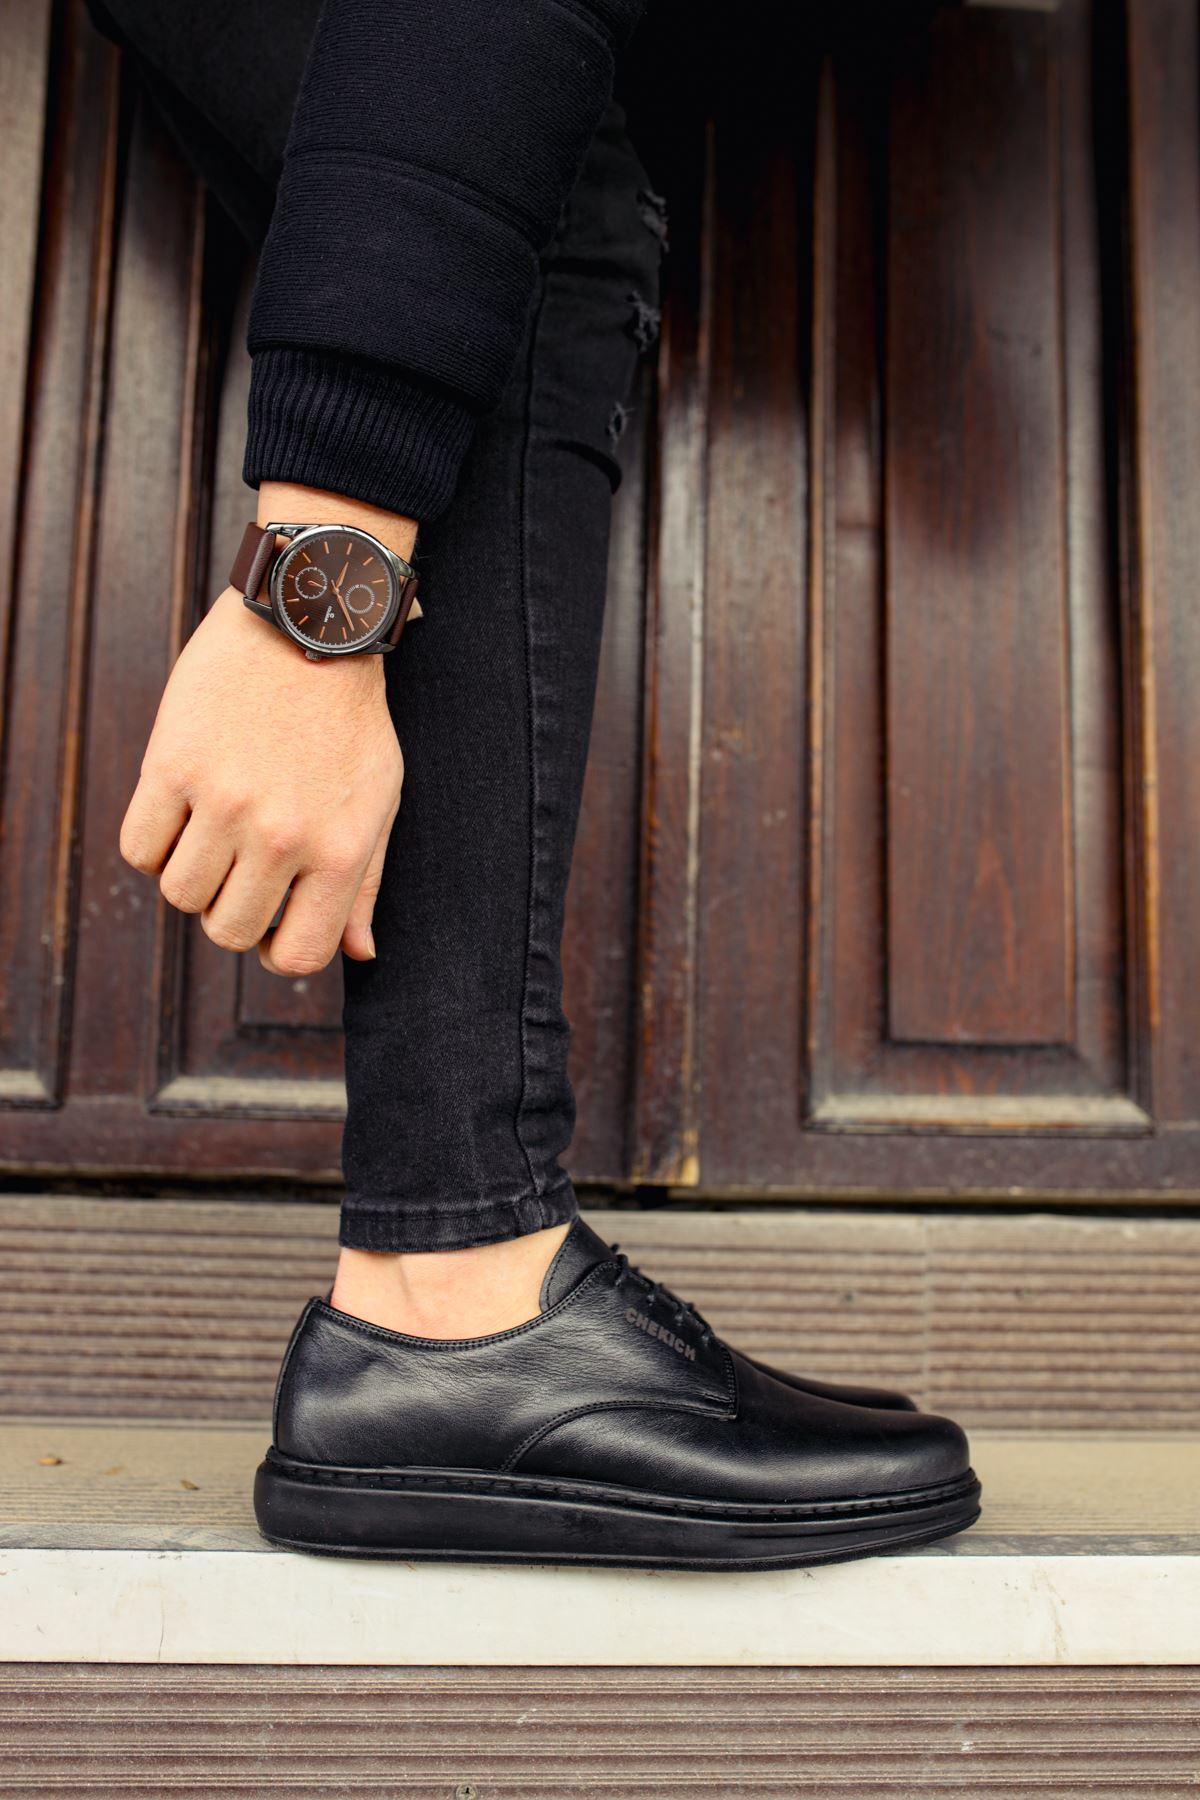 Chekich CH003 ST Hakiki Deri Erkek Ayakkabı SIYAH